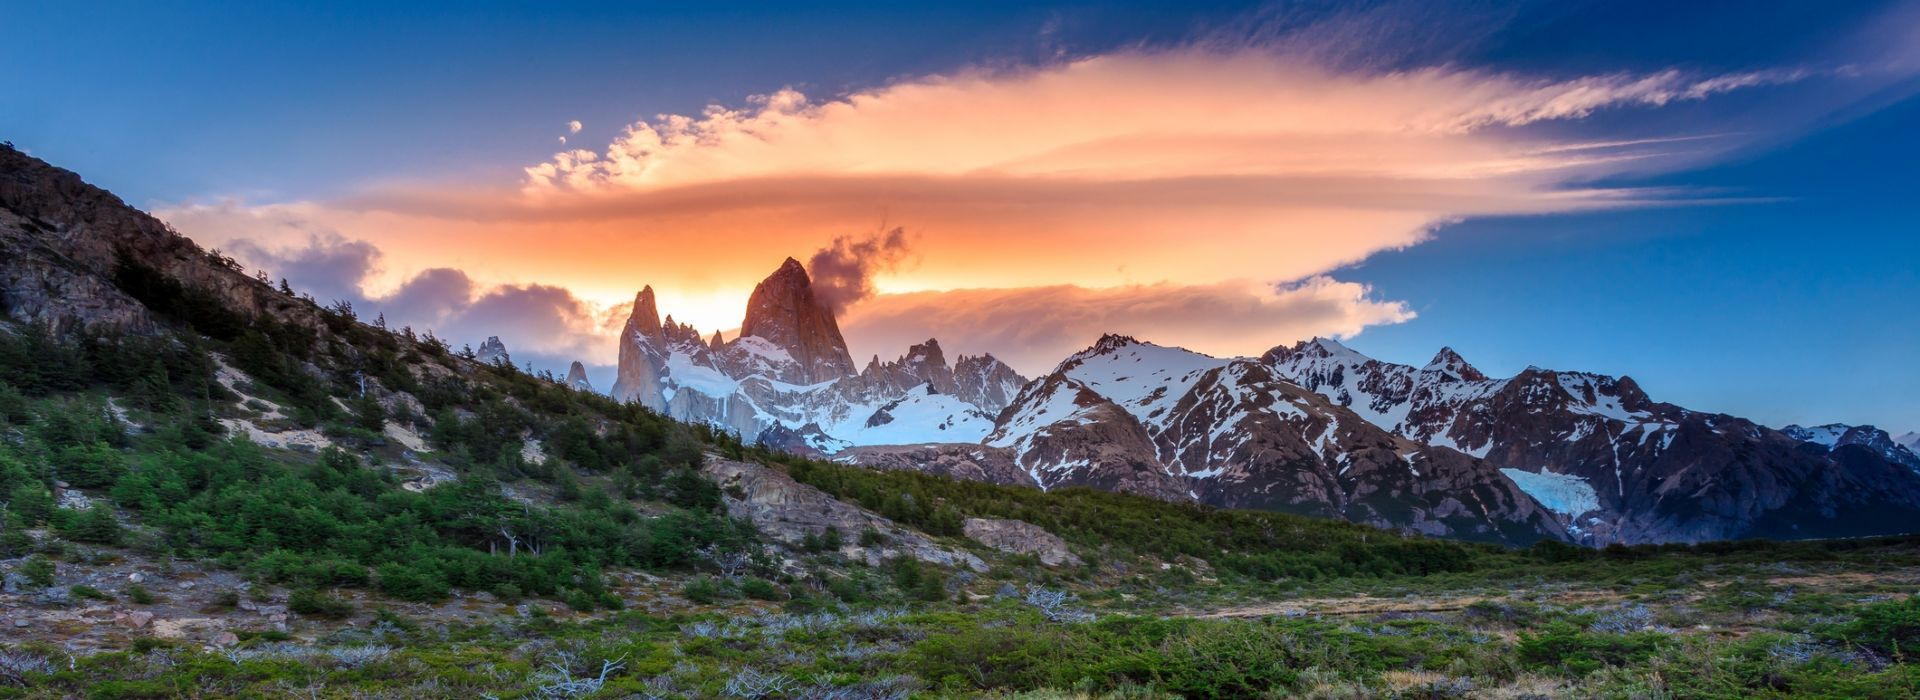 Natural landmarks sightseeing Tours in Ushuaia